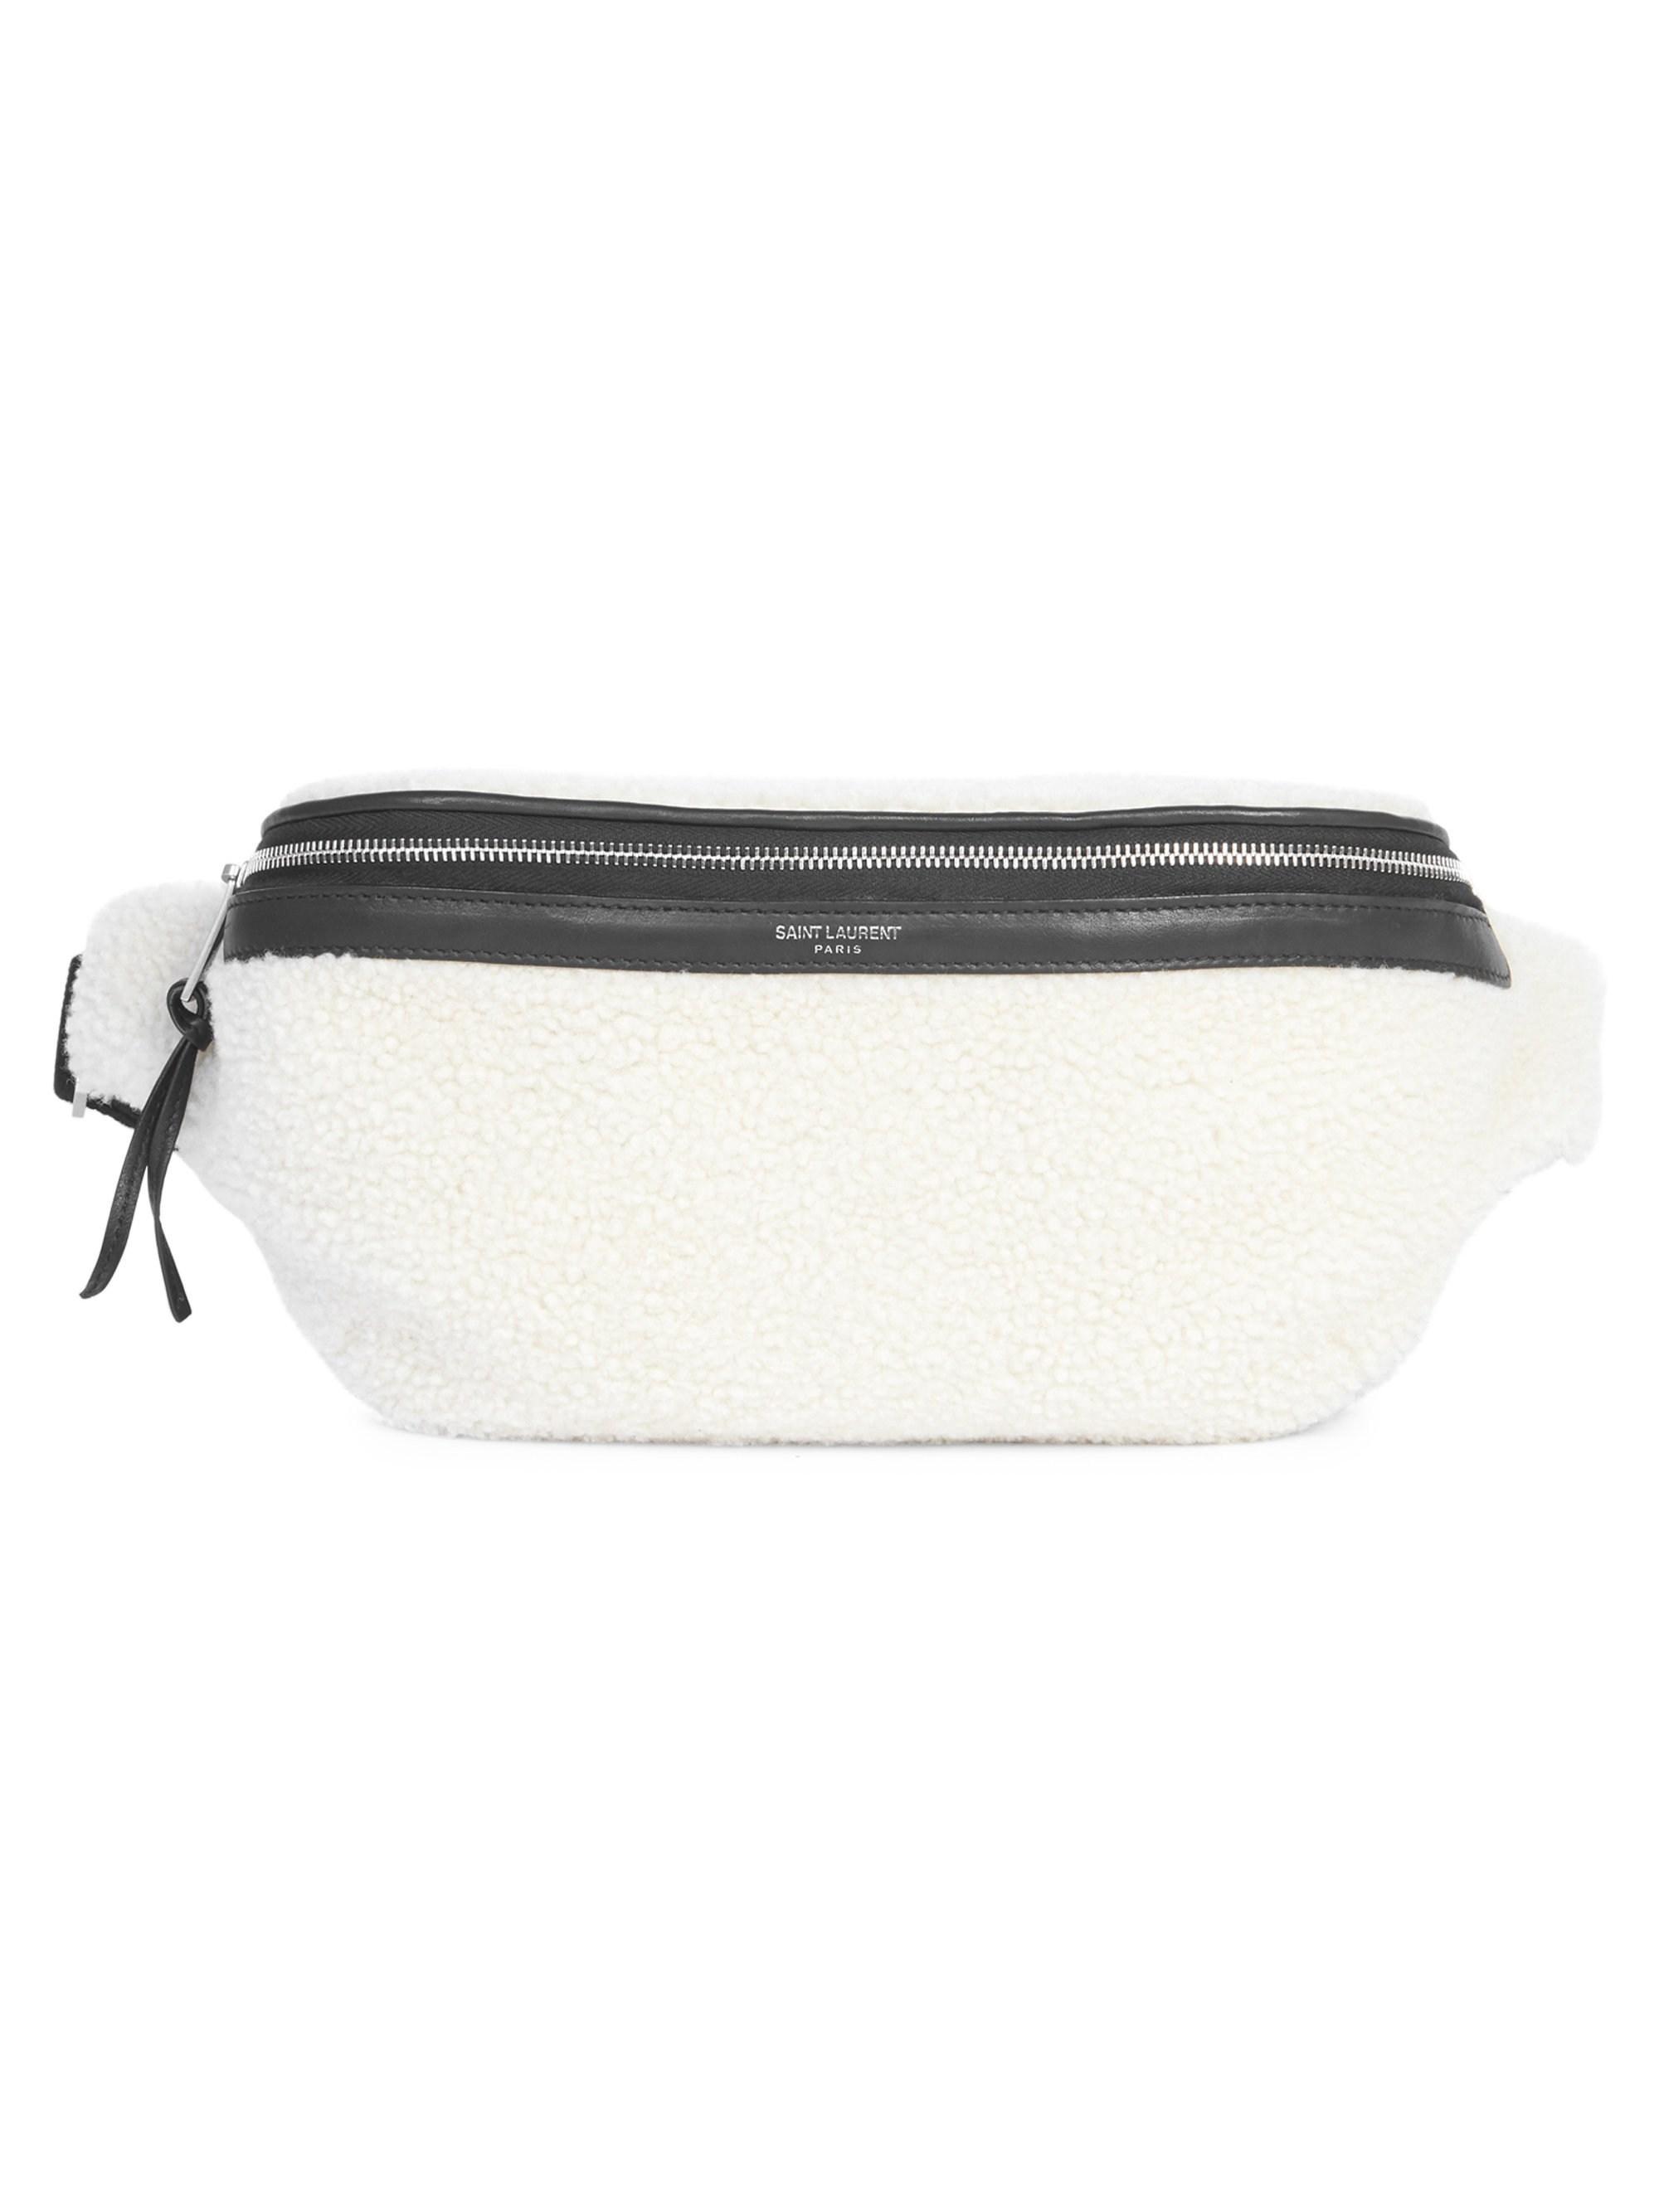 4575b034 Saint Laurent Men's Marsupio Plush Belt Bag - Natural Black for men